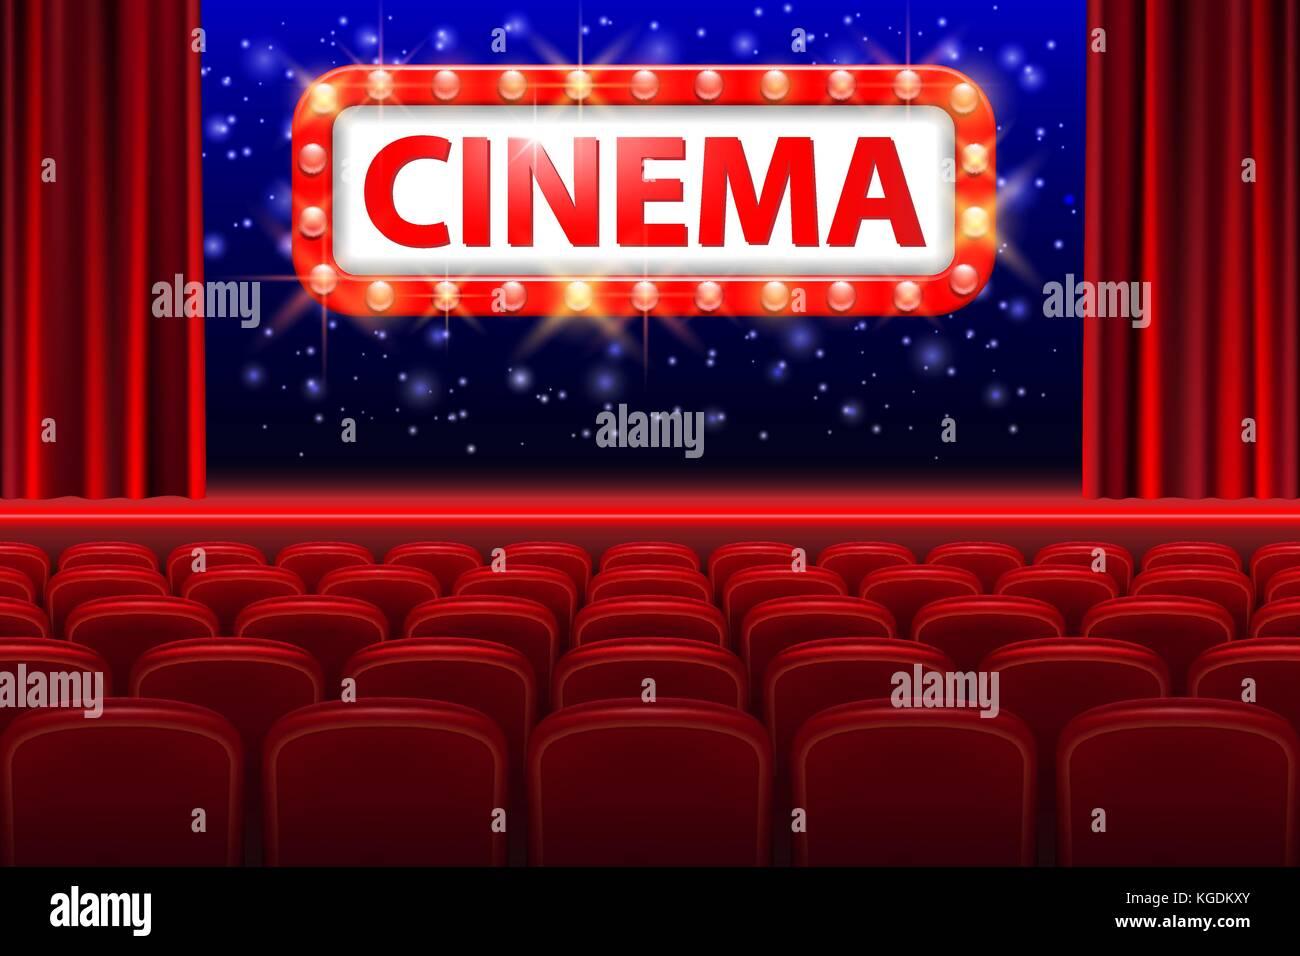 Realistische Kino Interieur mit roten Sitzen. retro style Kino mit ...